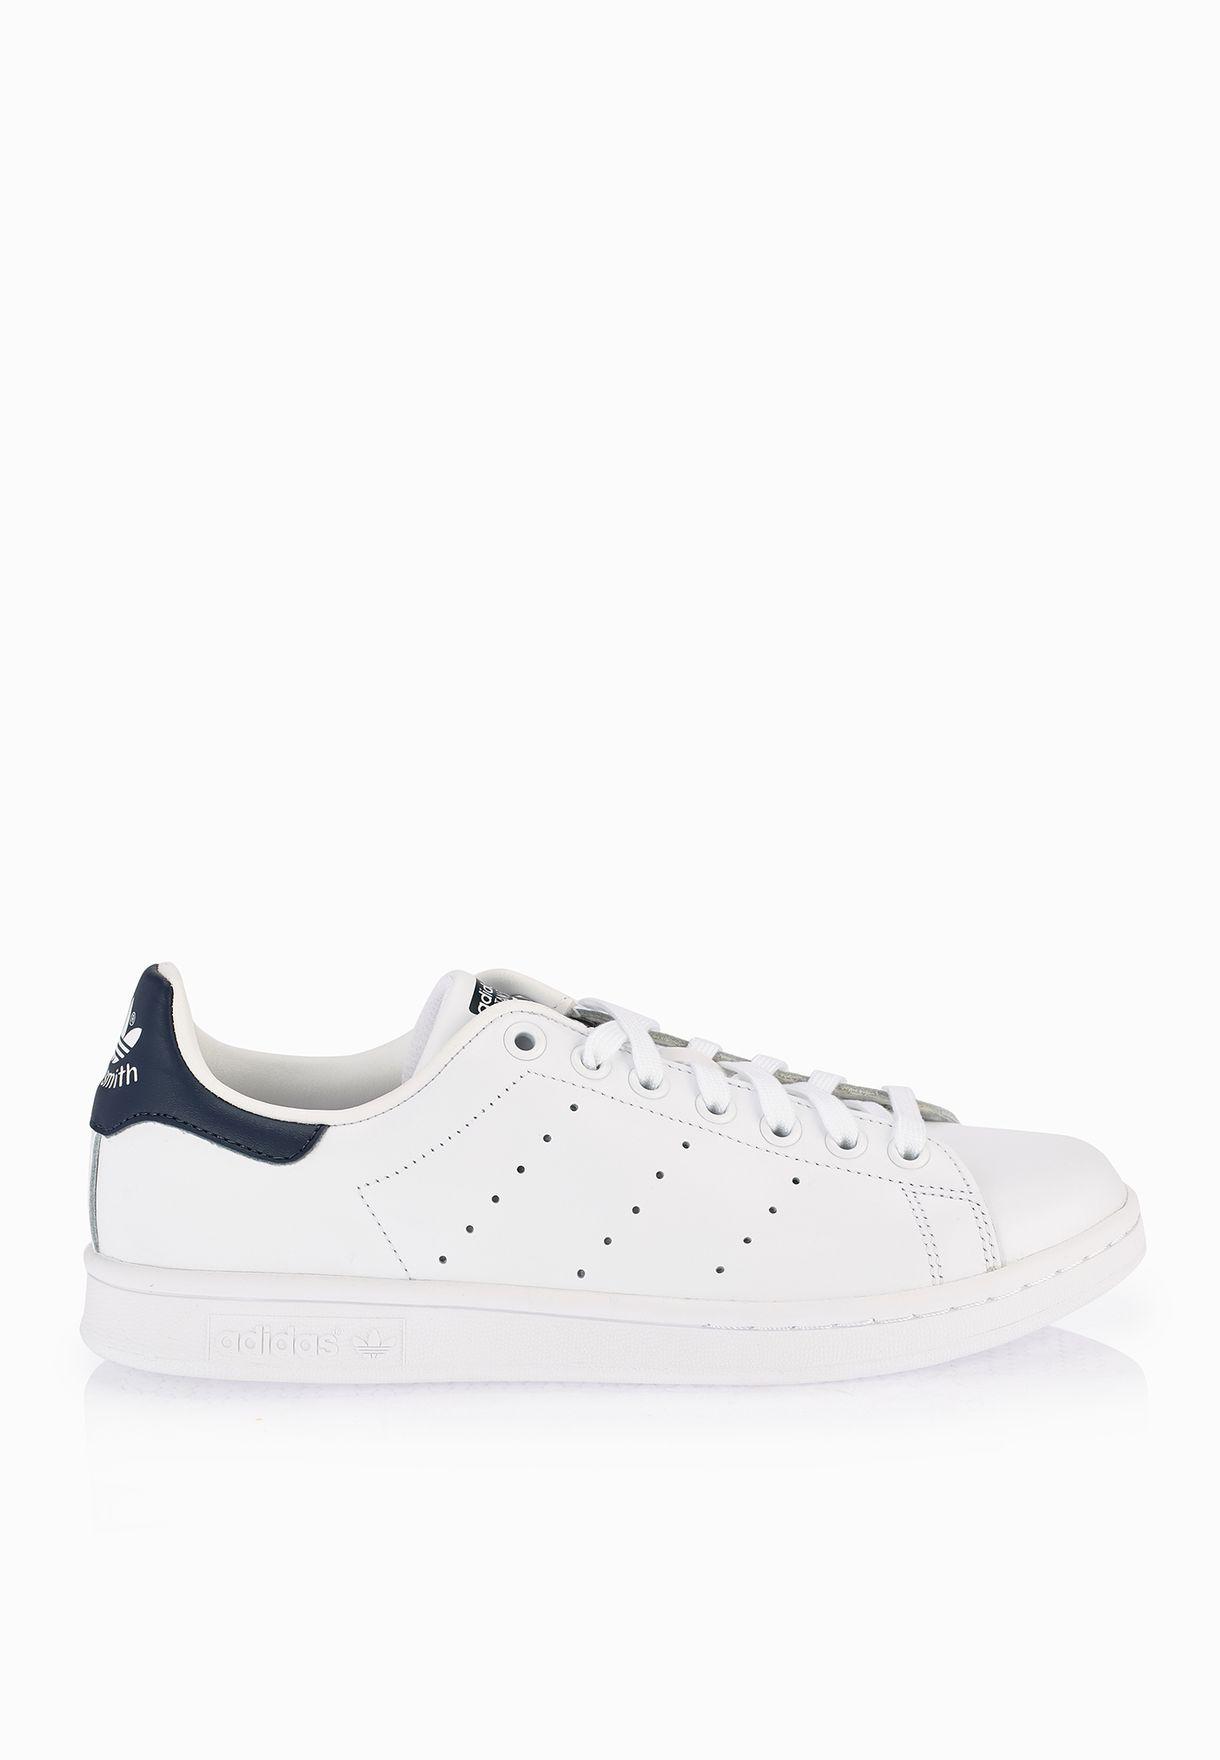 Shop adidas Originals white Stan Smith M20325 for Women in Oman -  AD478SH18FQZ 54a680849